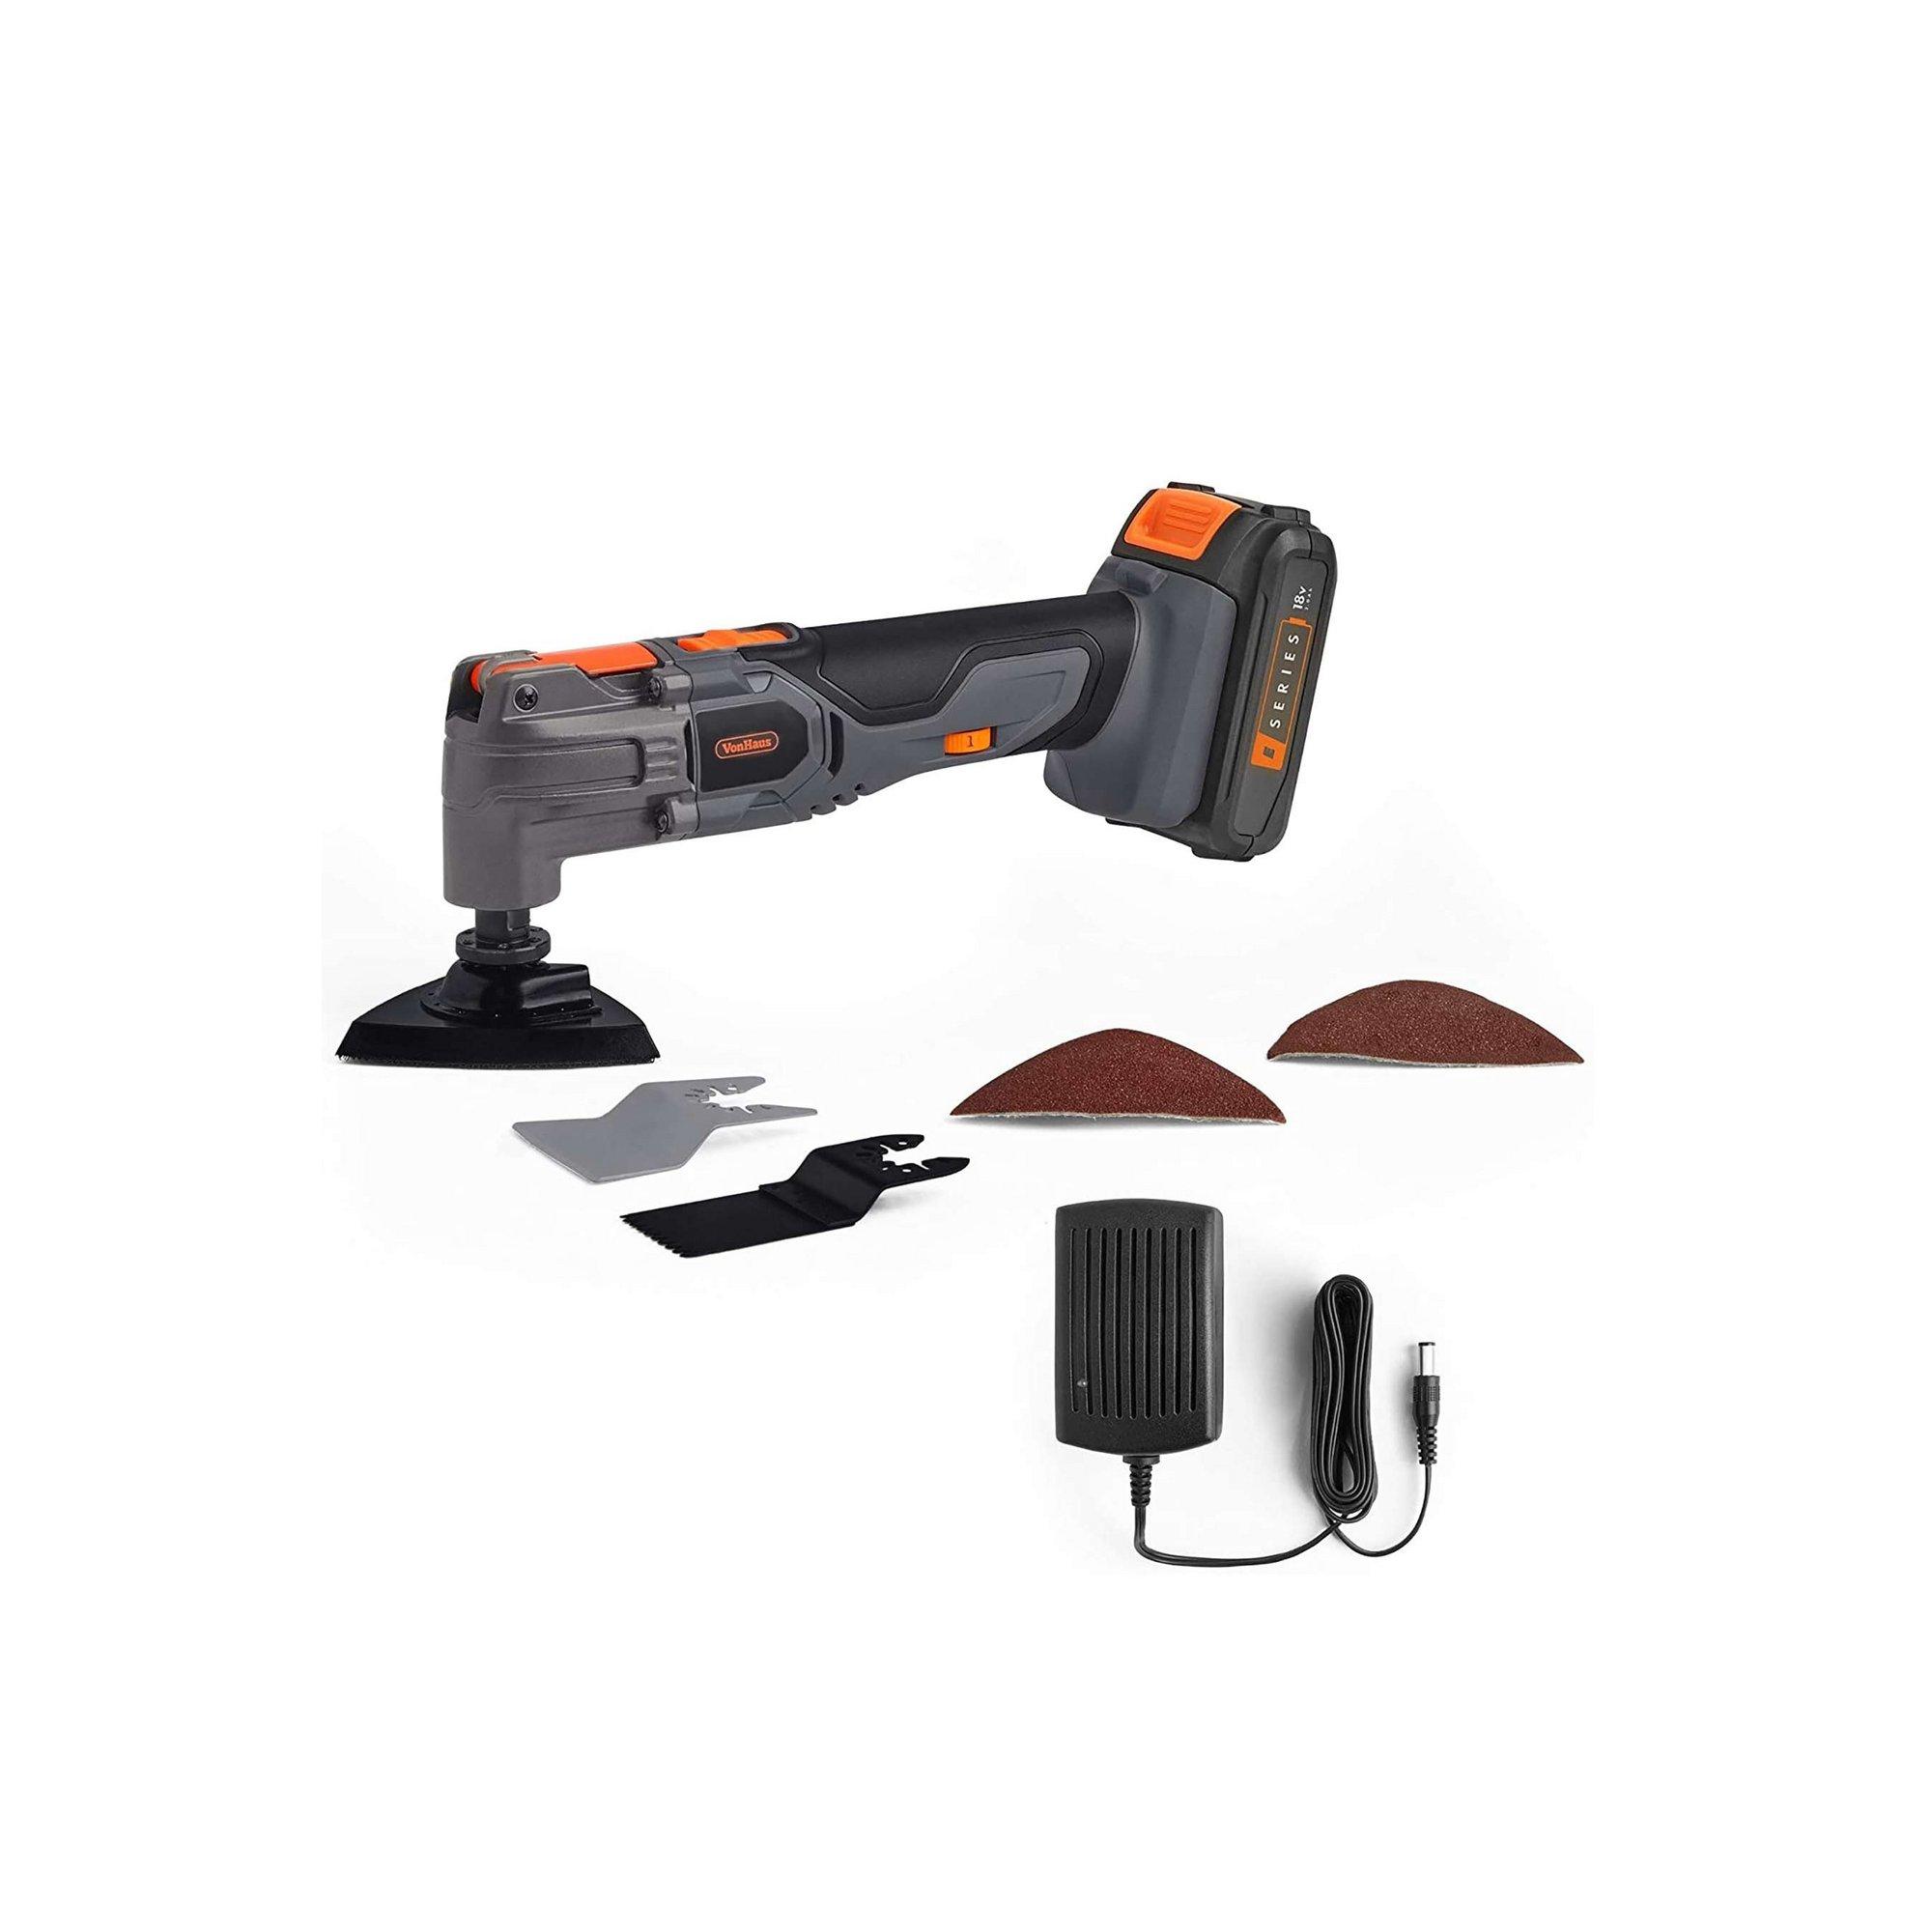 Image of VonHaus E-Series 18V Cordless Oscillating Multi Tool